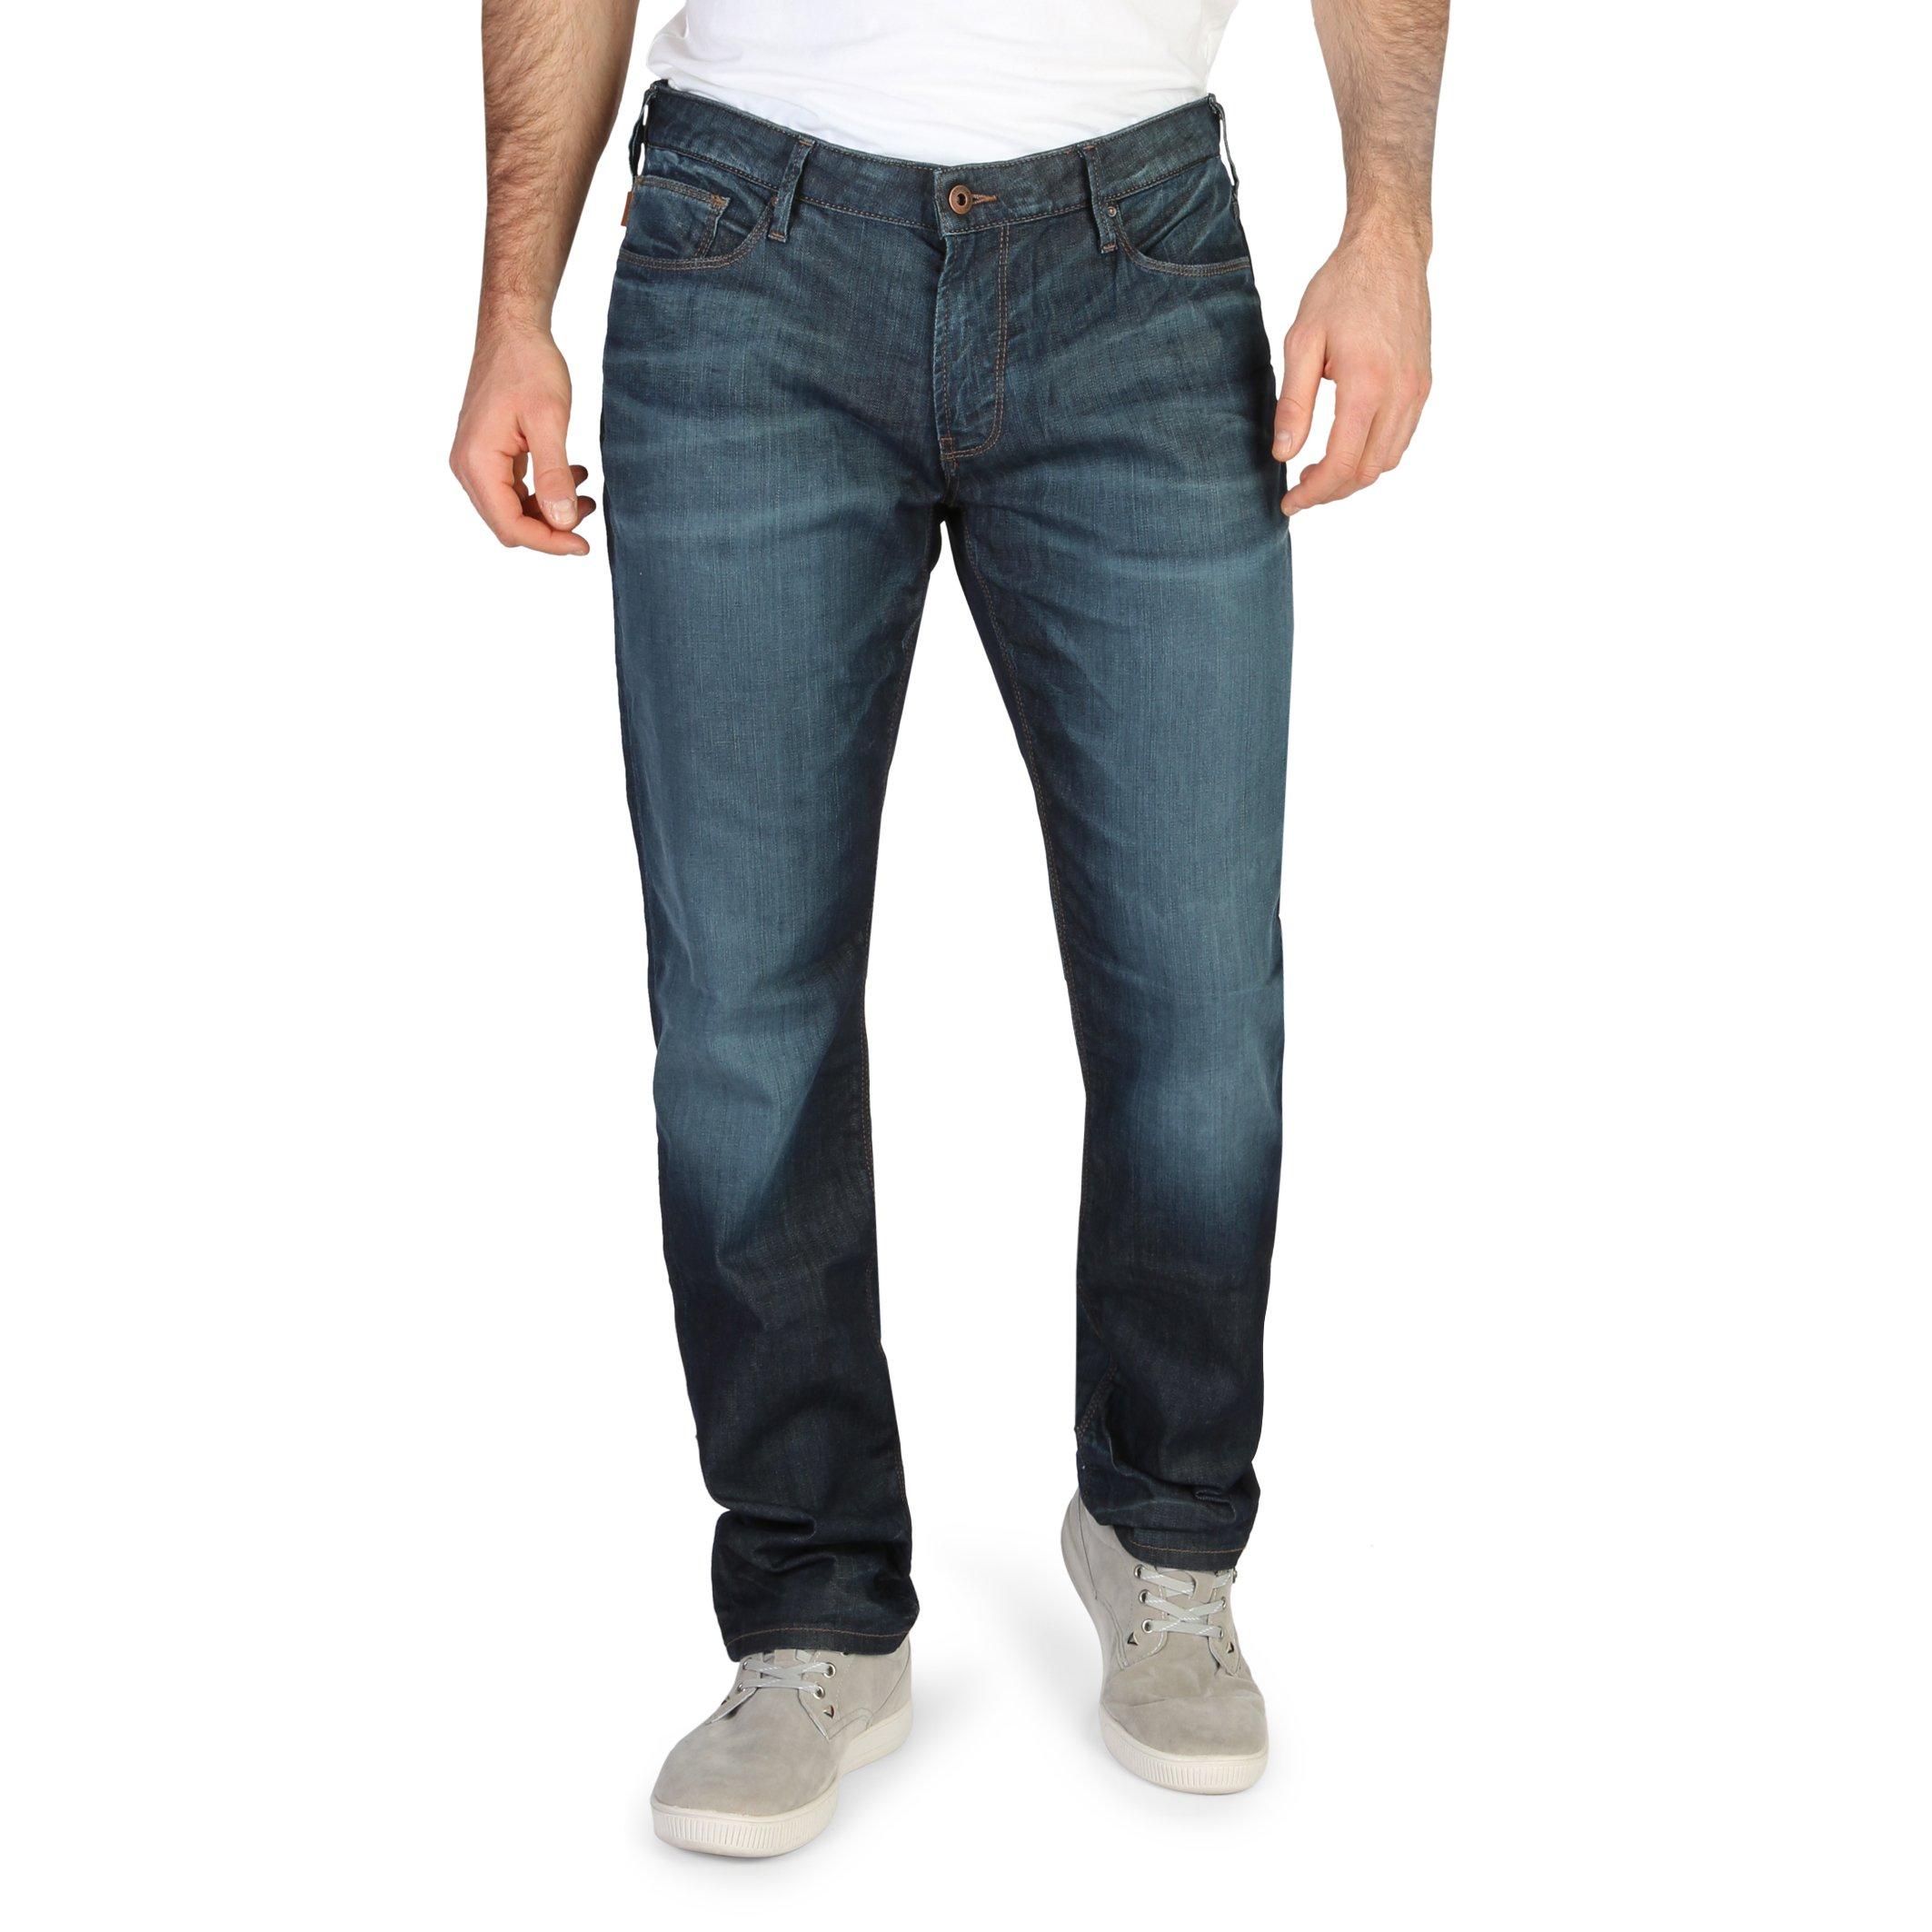 Emporio Armani Men's Jeans Blue 330055 - blue-2 29